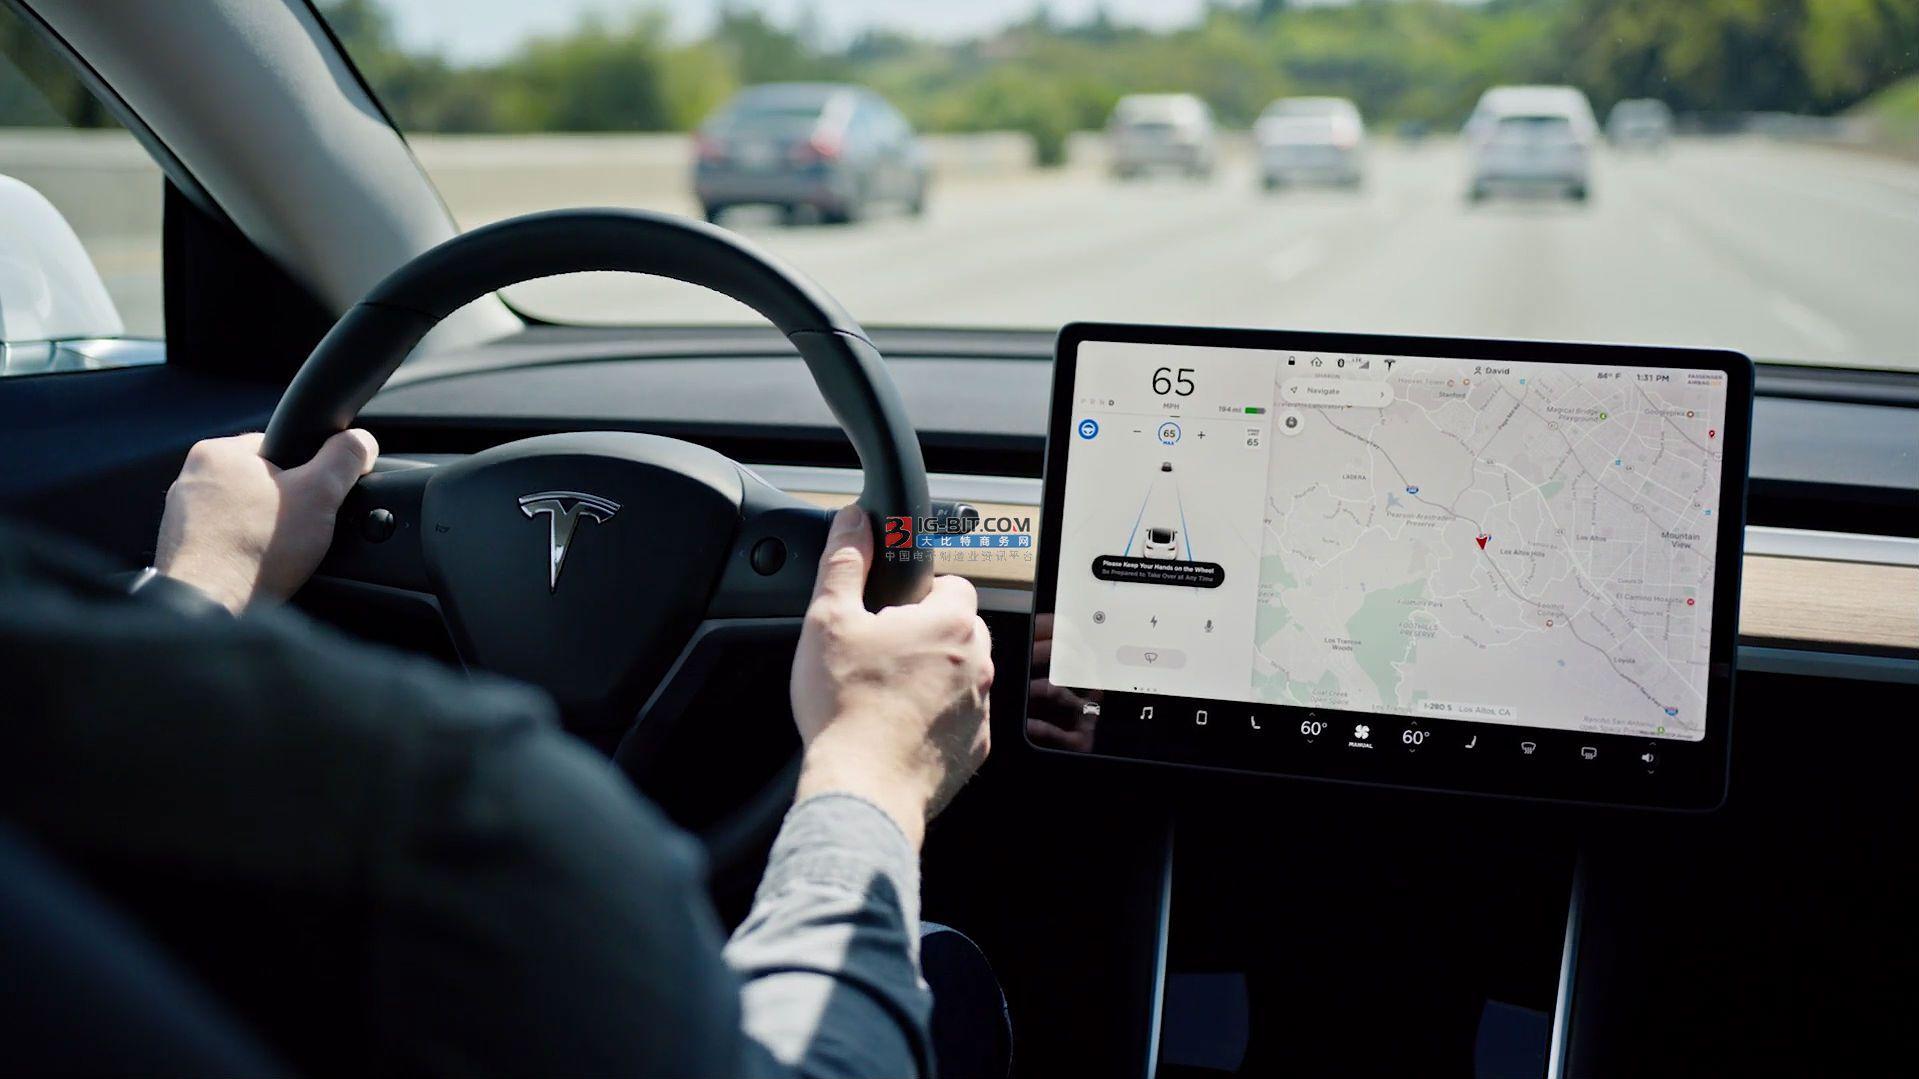 AutoX创始人:自动驾驶未来两三年内可实现拿掉安全员